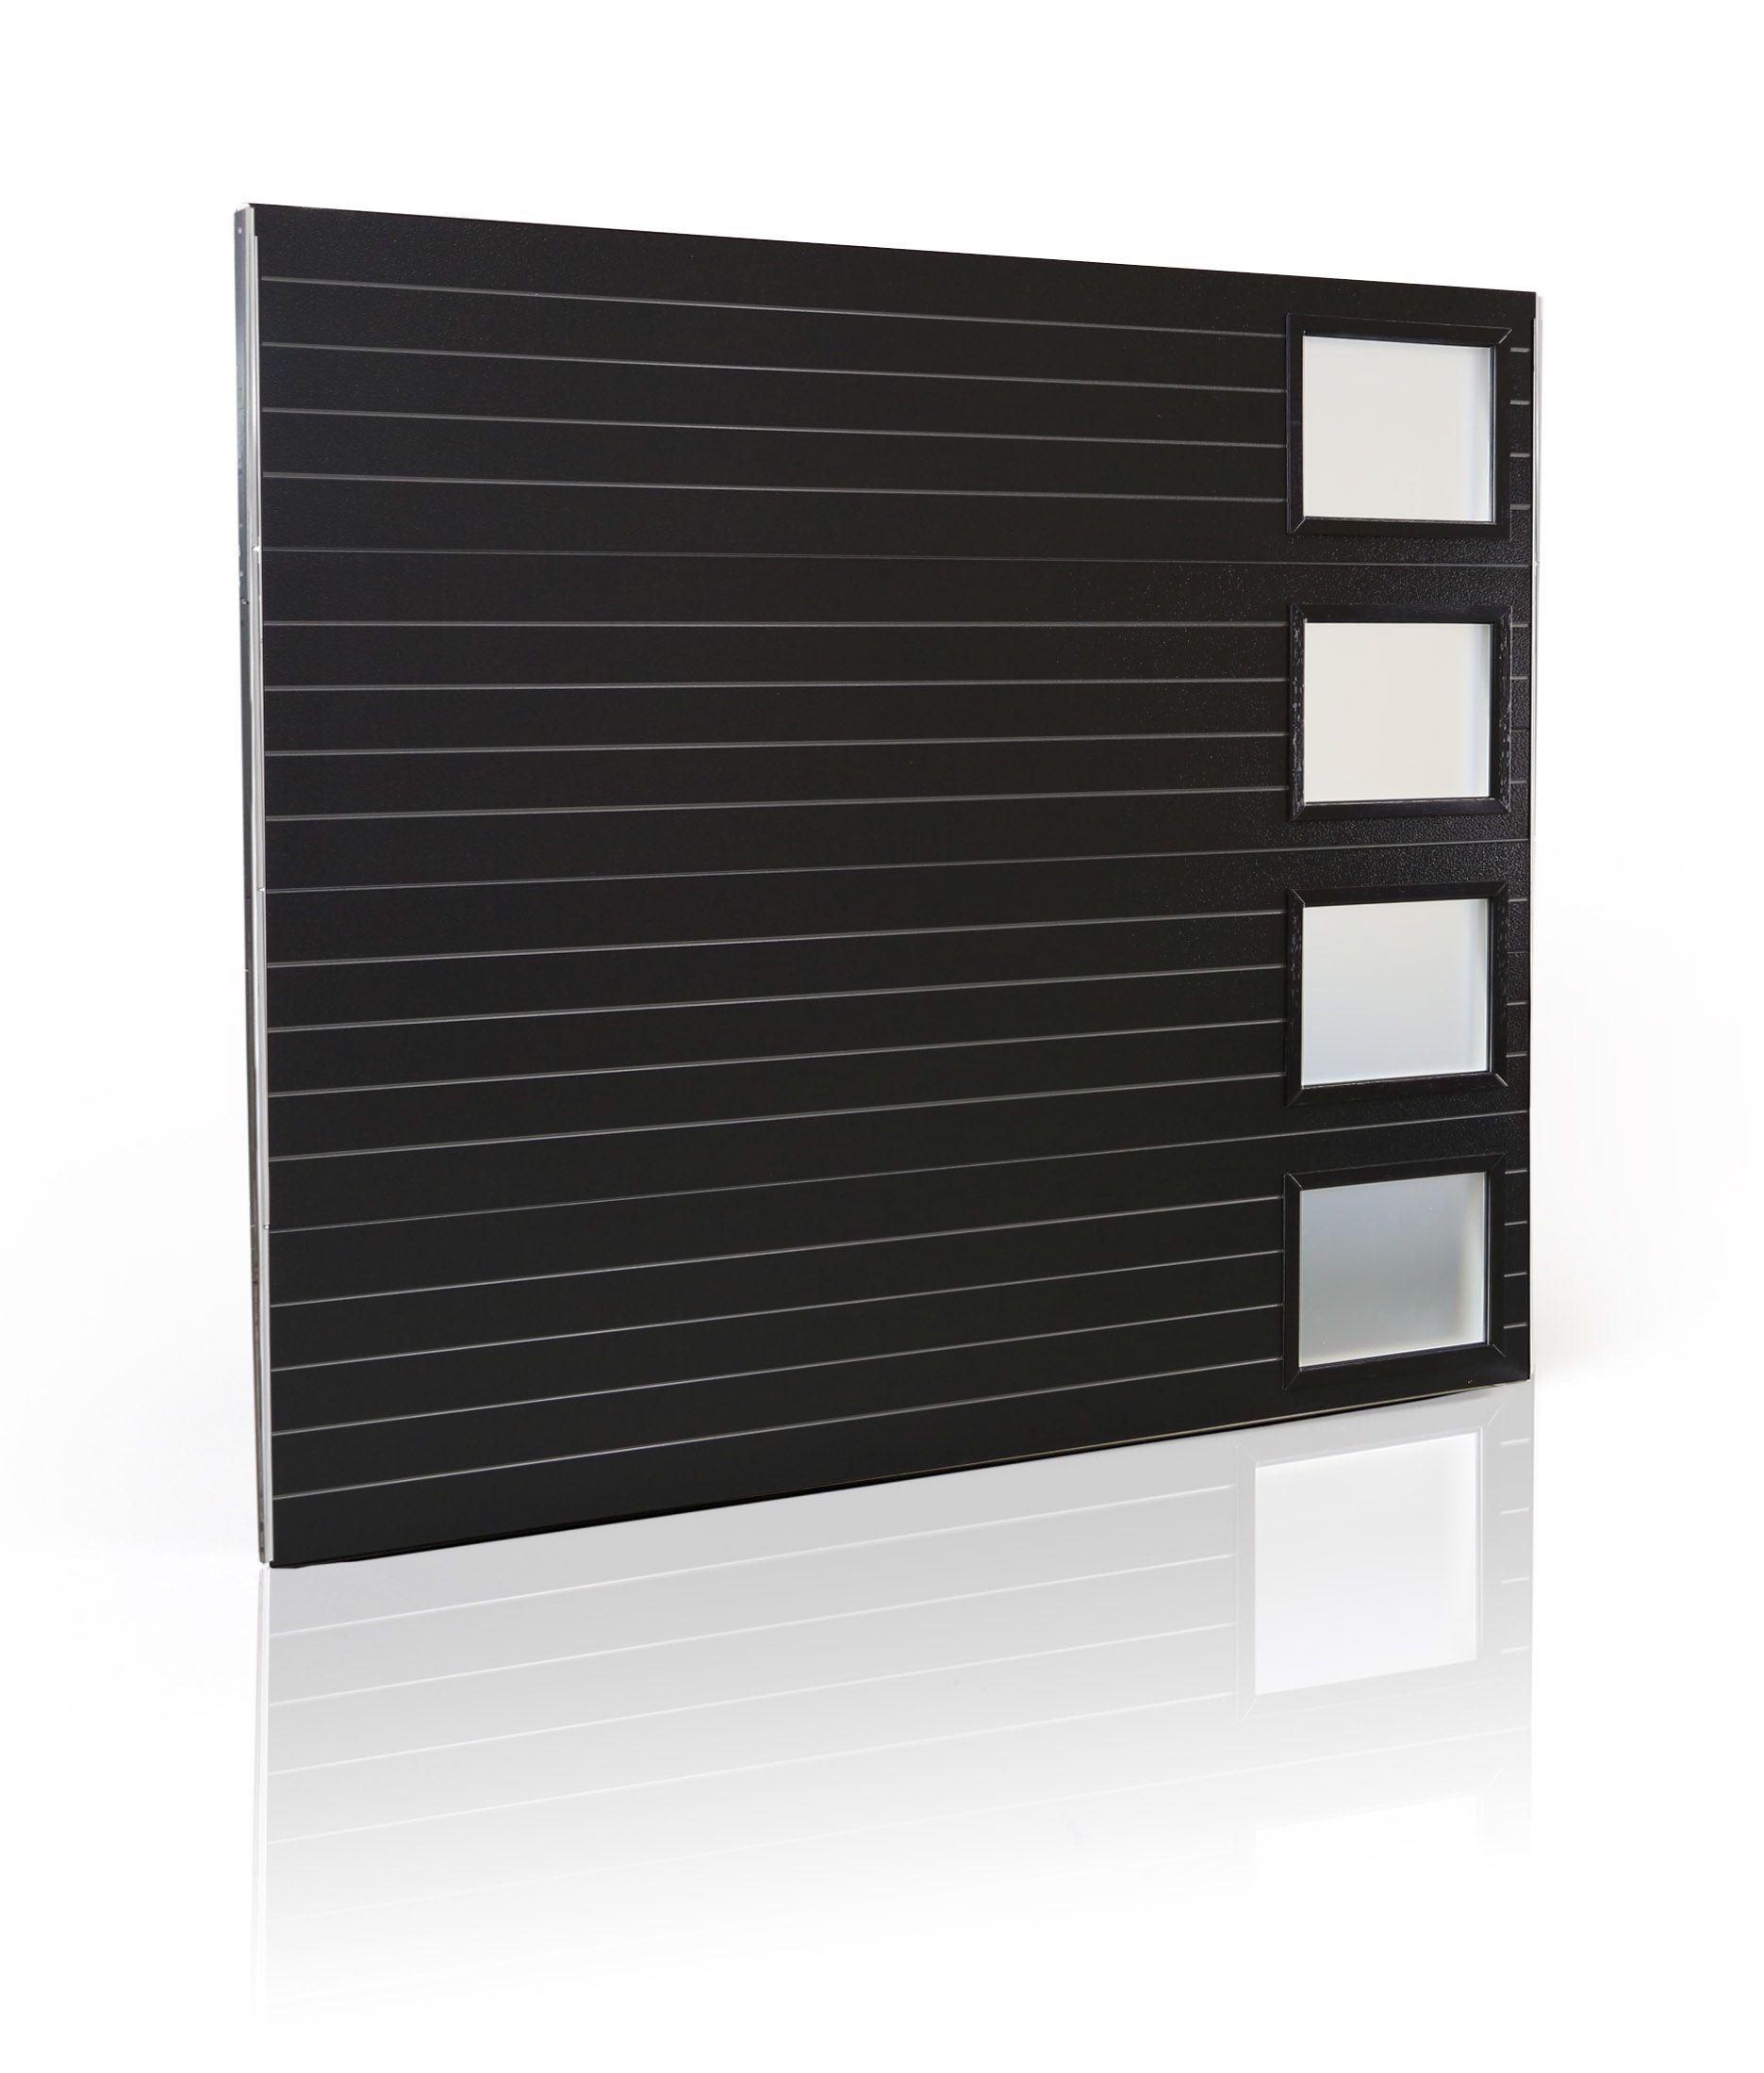 Clopay Modern Steel Collection Garage Door Shown In Black